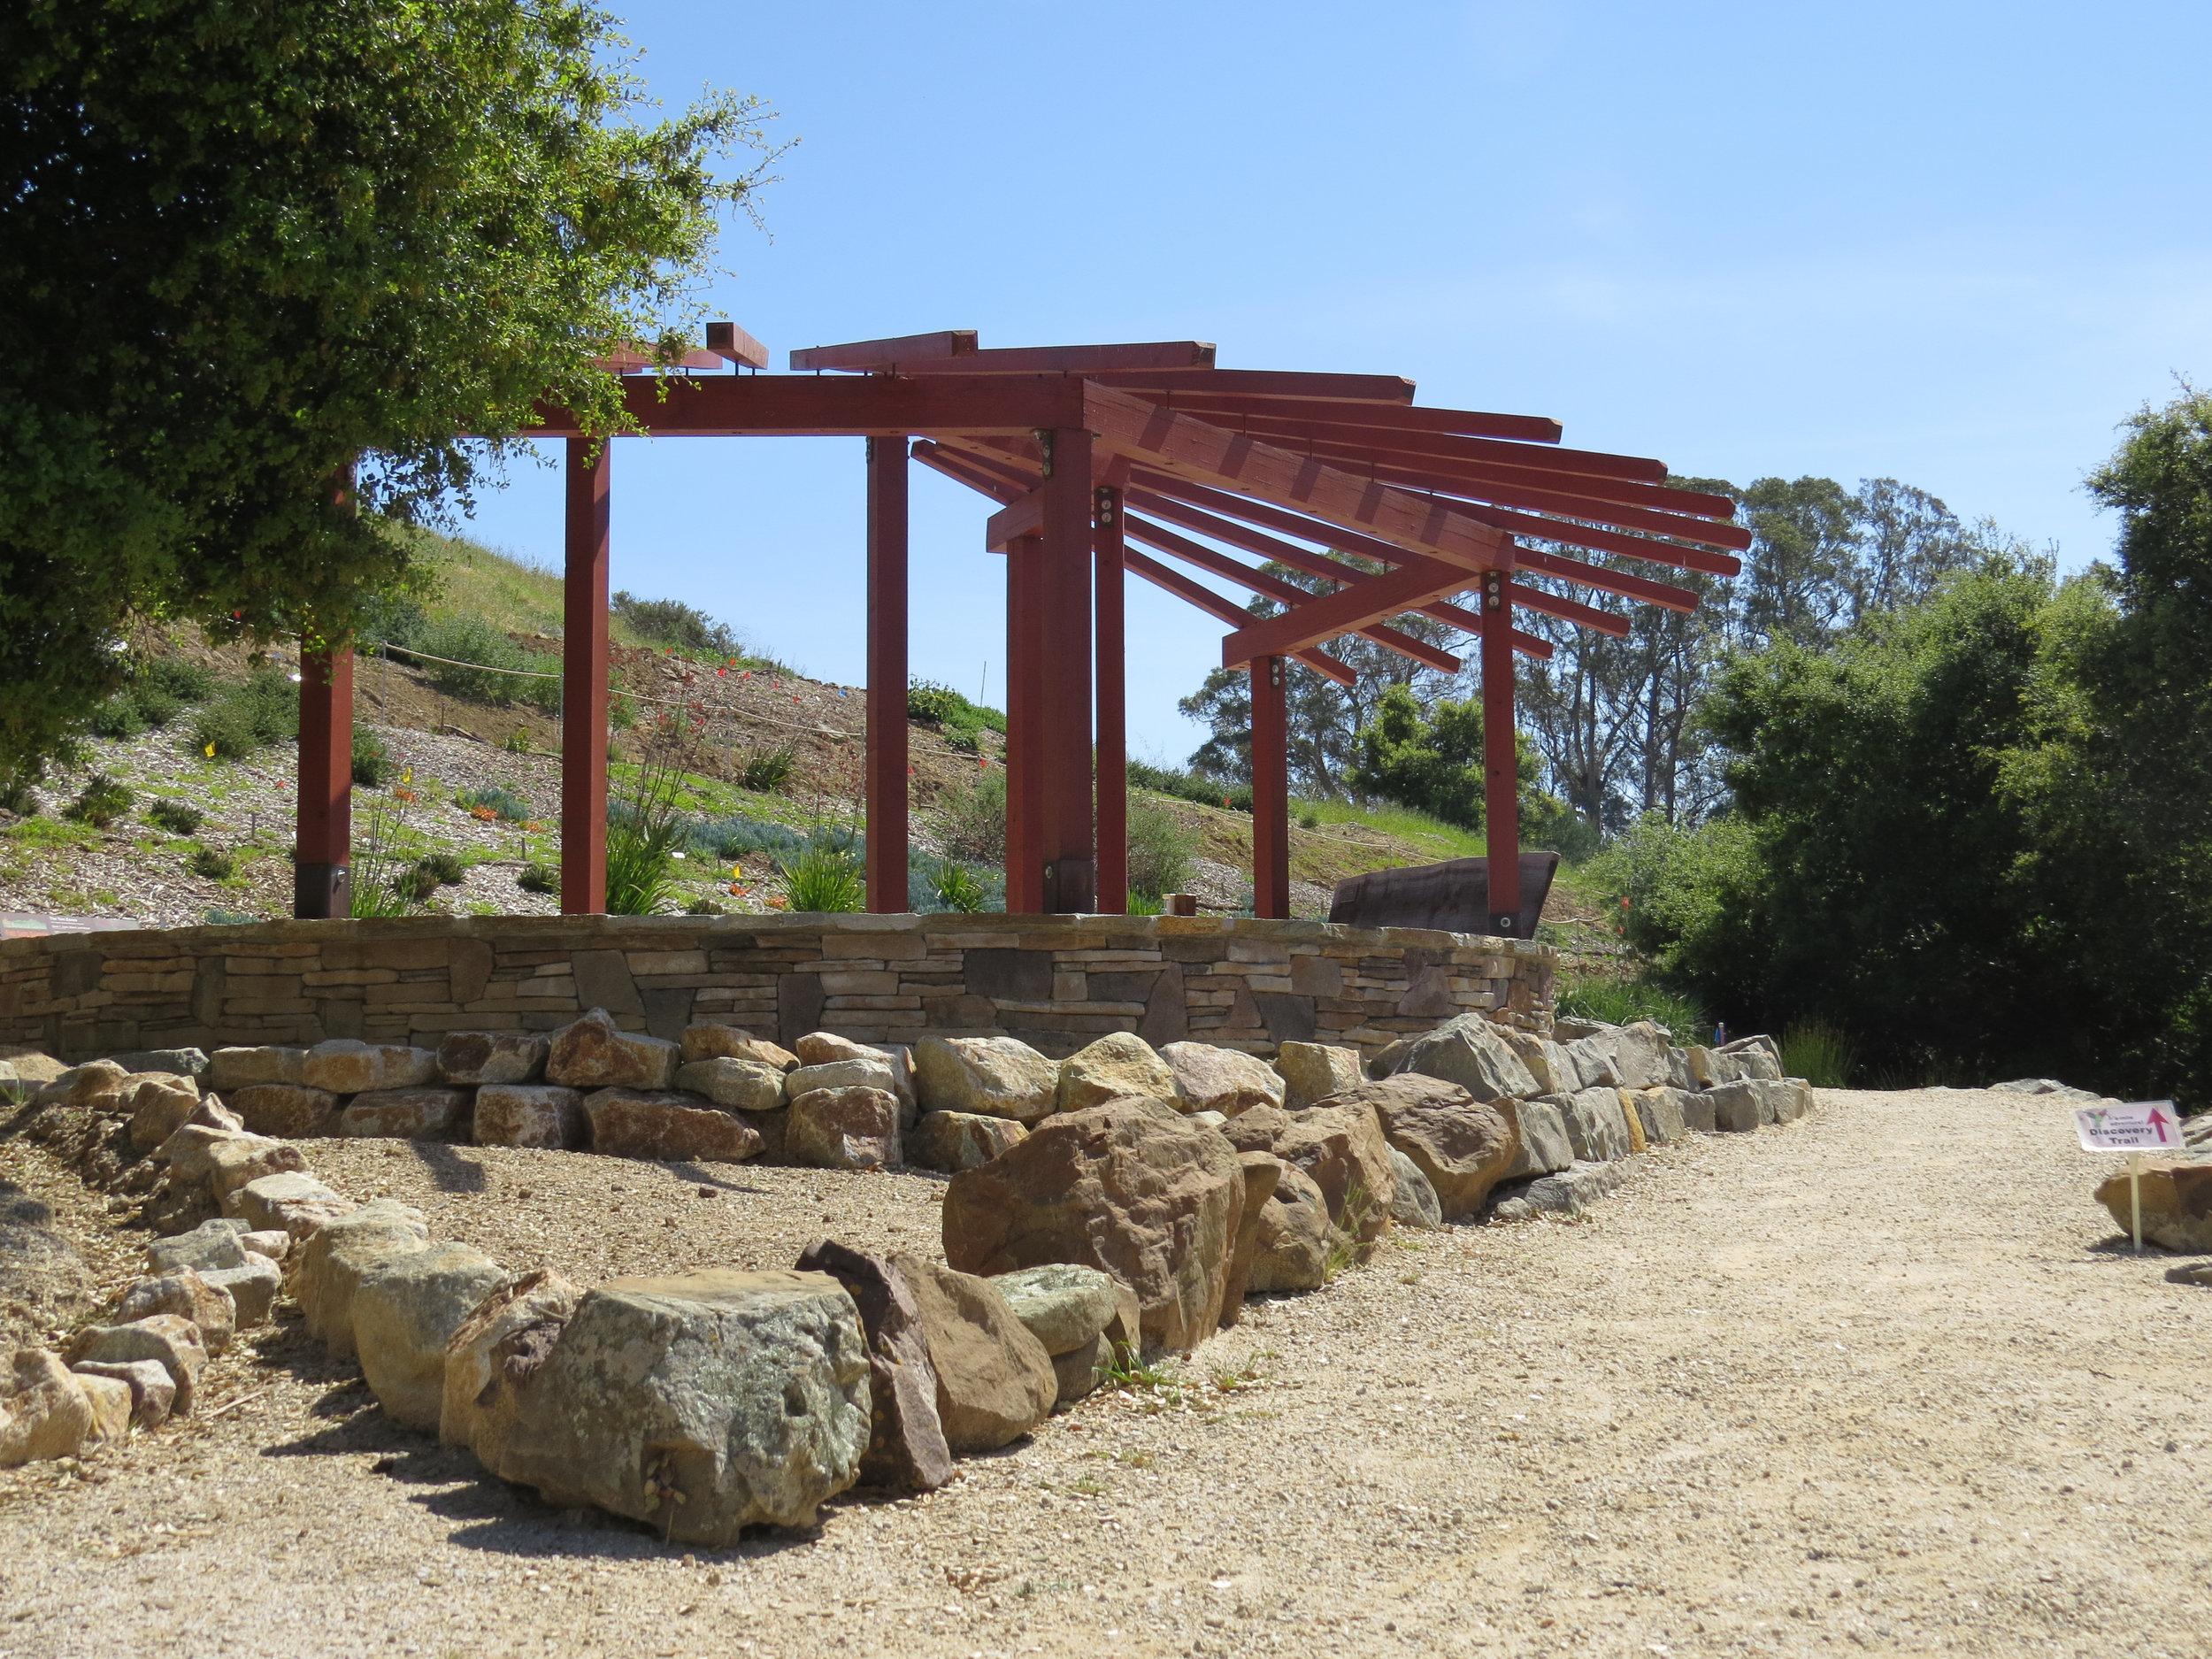 San Luis Obispo Botanical Garden Fire Safe Pergola